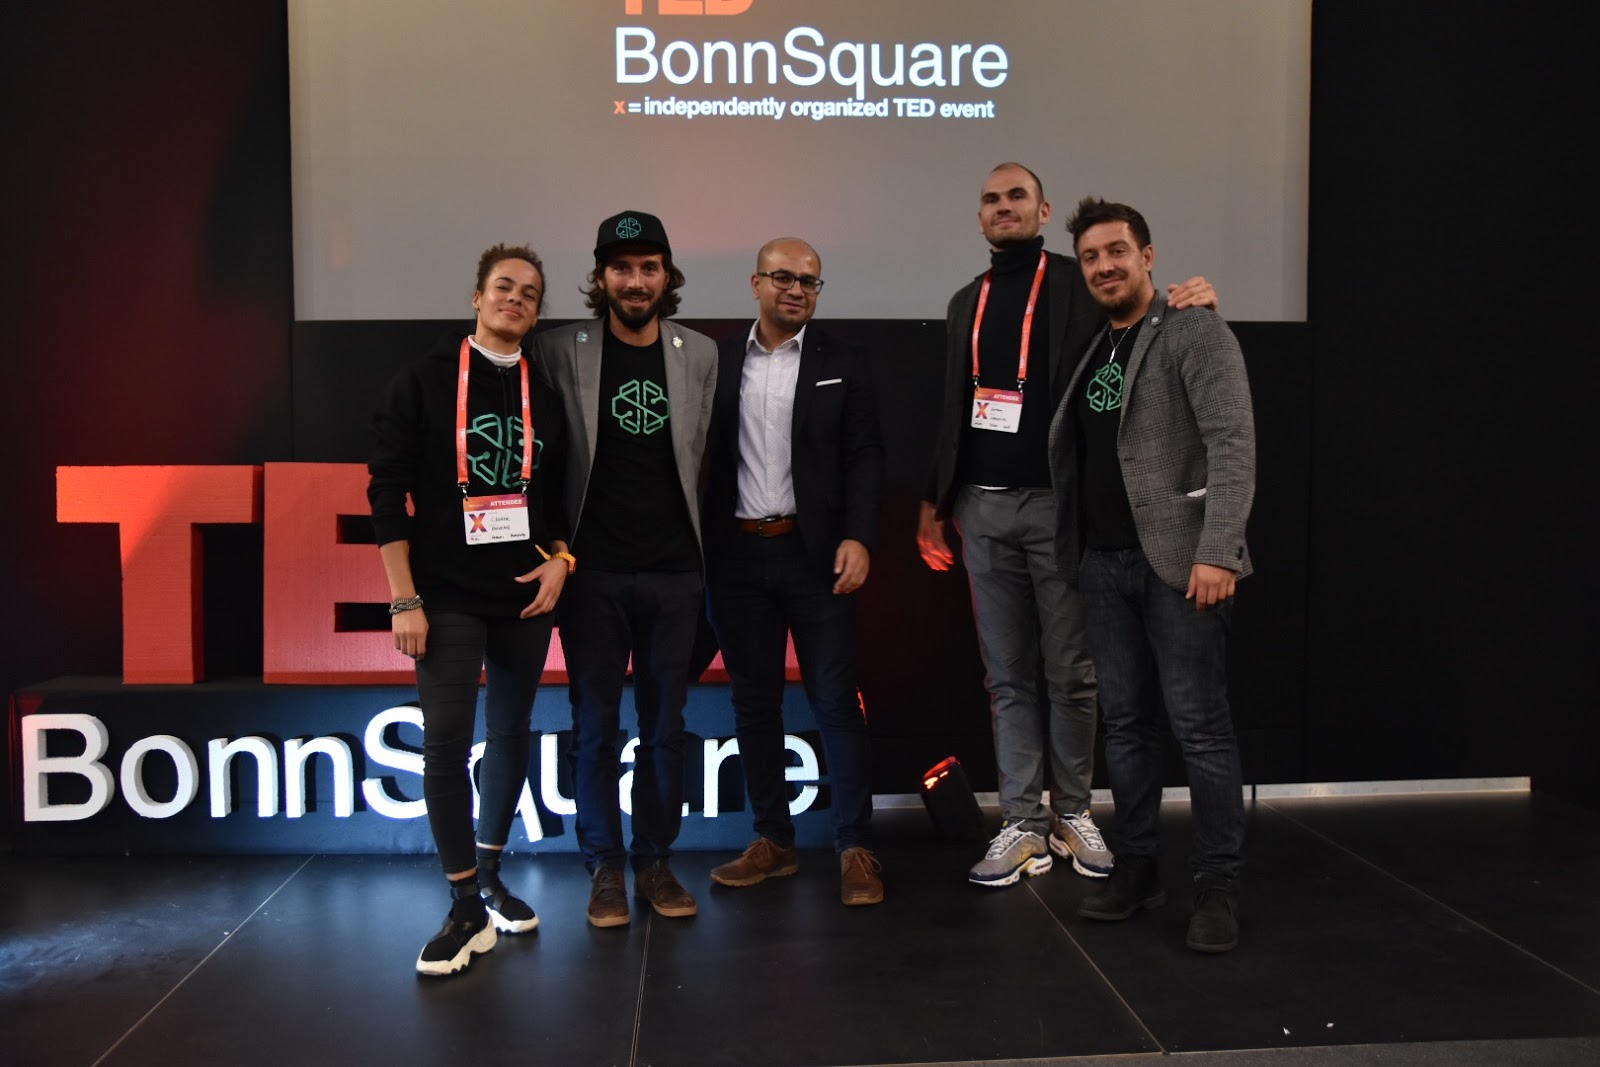 SwissBorg eam Tedx BonnSquare